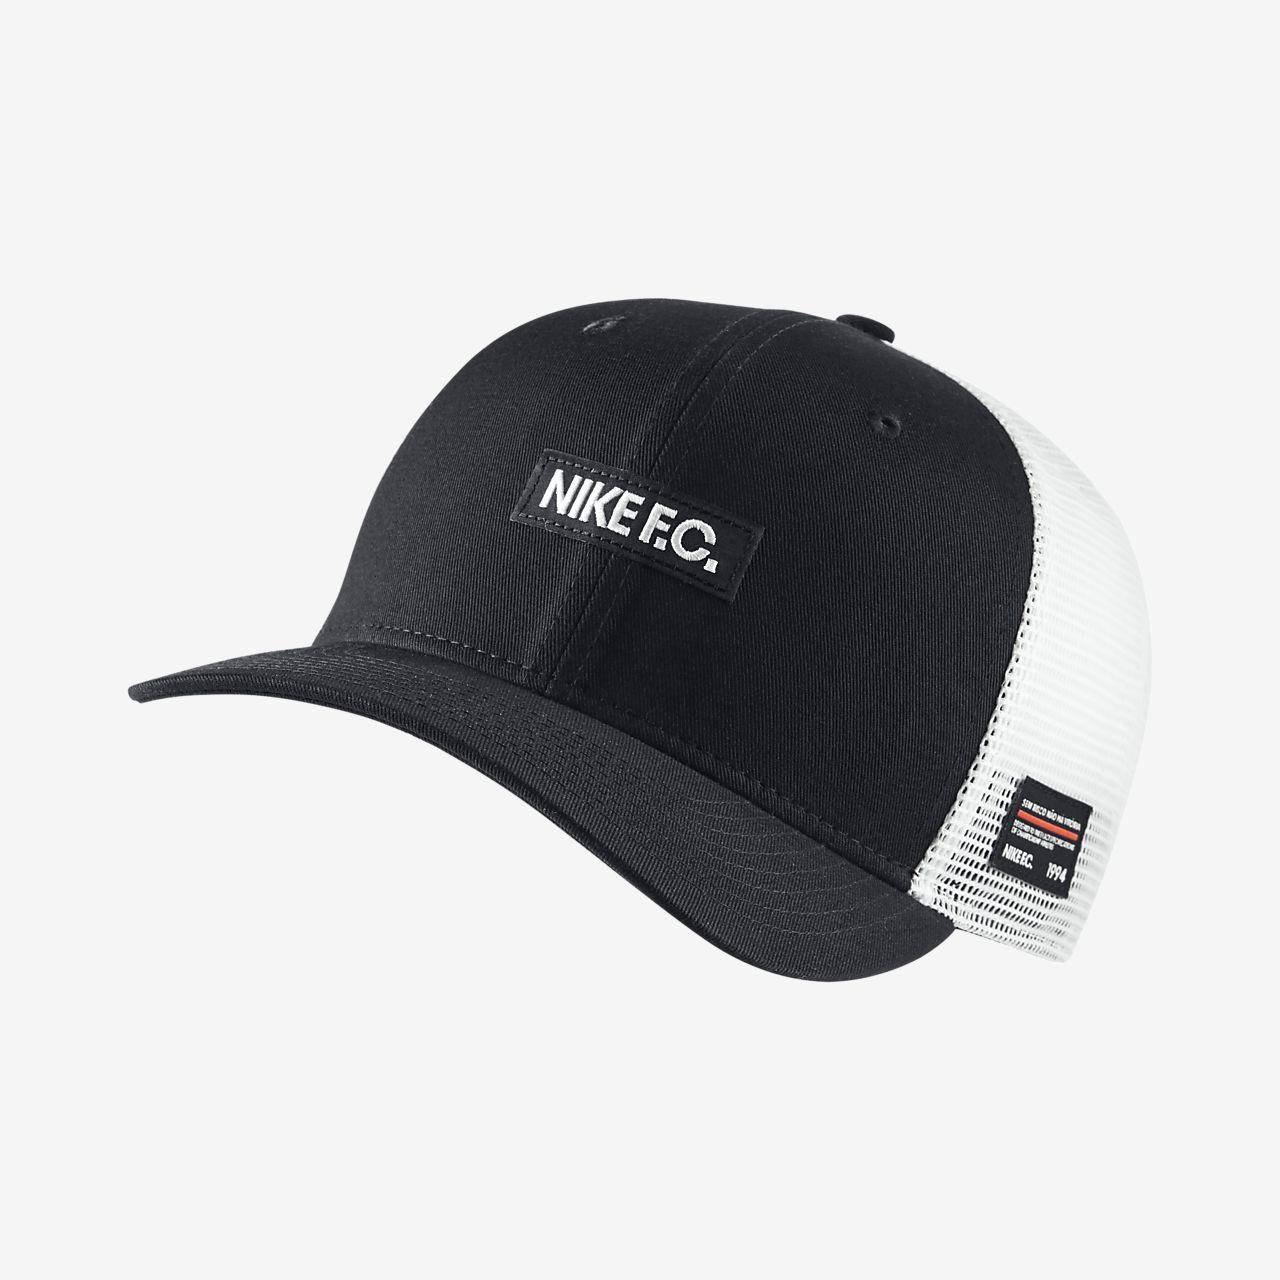 87d6a6a34 Nike F.C. Classic99 Adjustable Hat